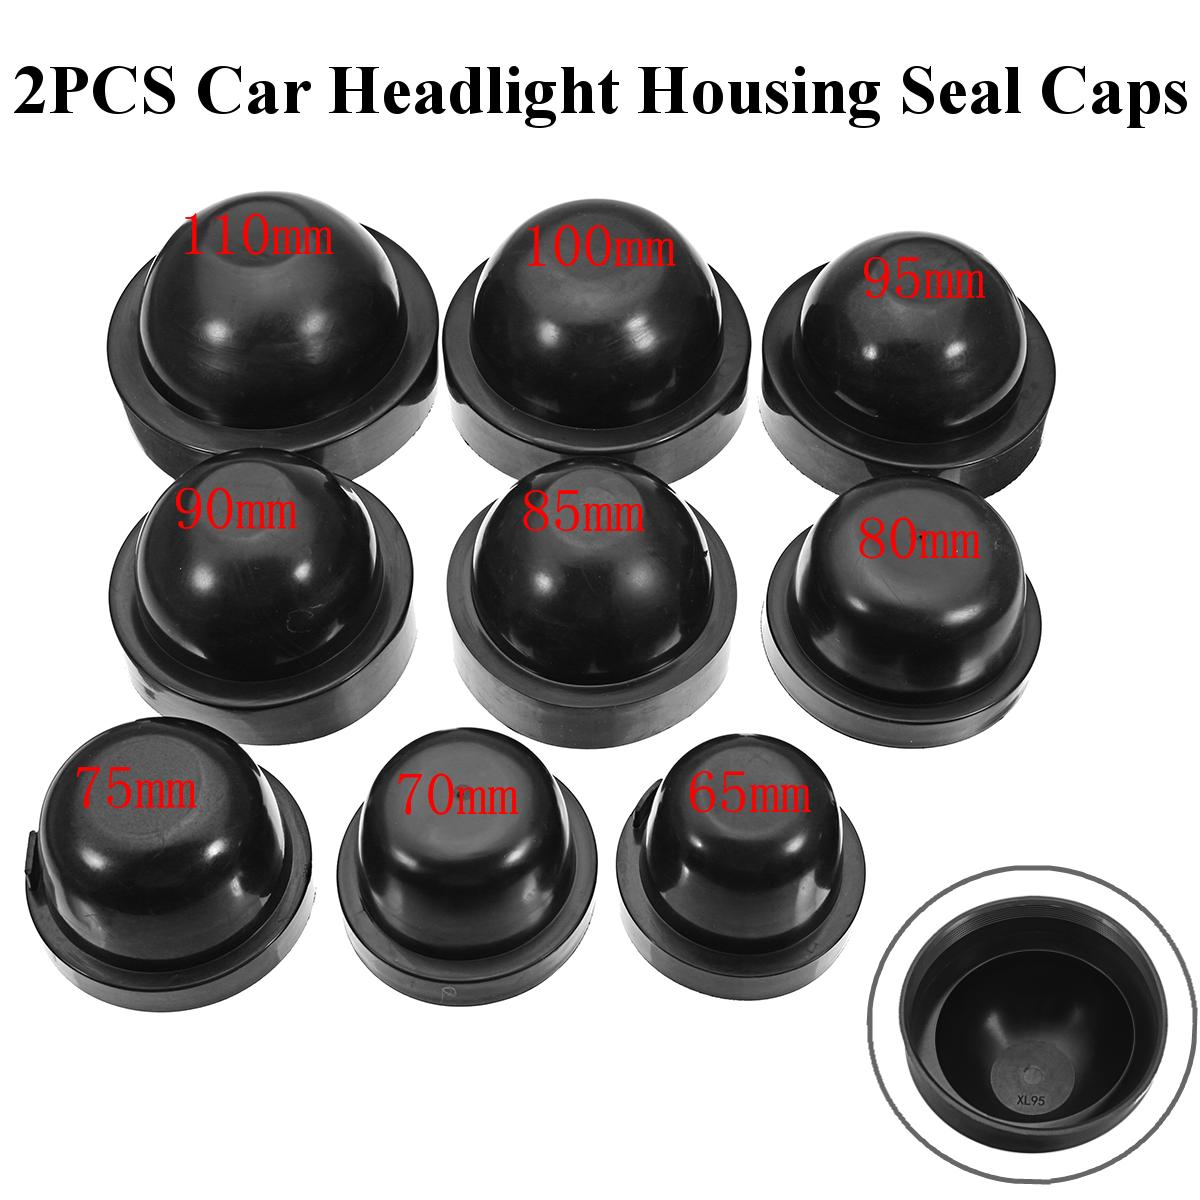 2pcs 95mm Rubber Housing Seal Cap Anti Dust Cover For Car Bulb HID Headlight